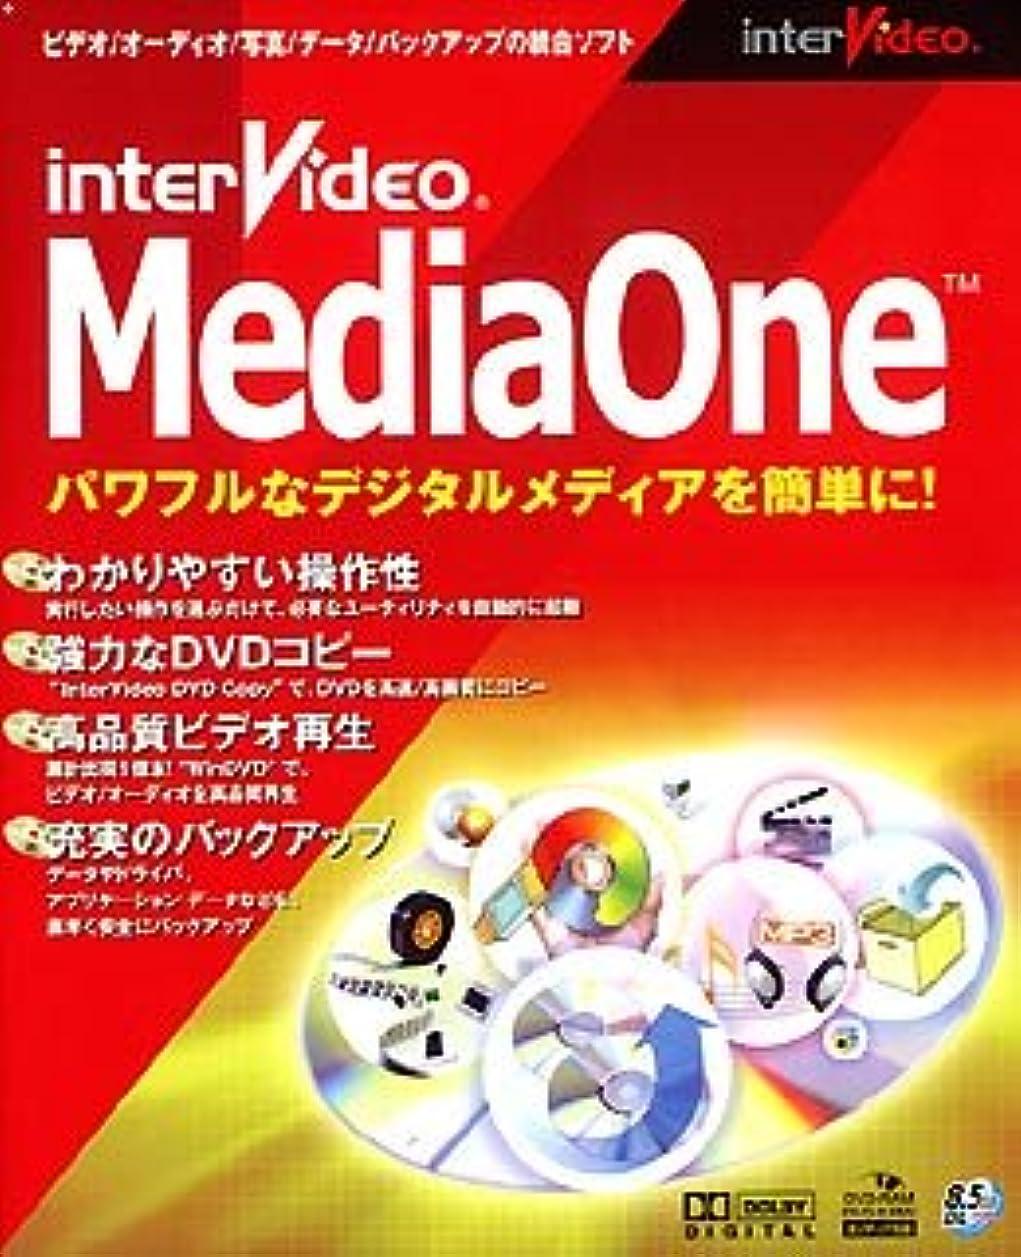 InterVideo MediaOne